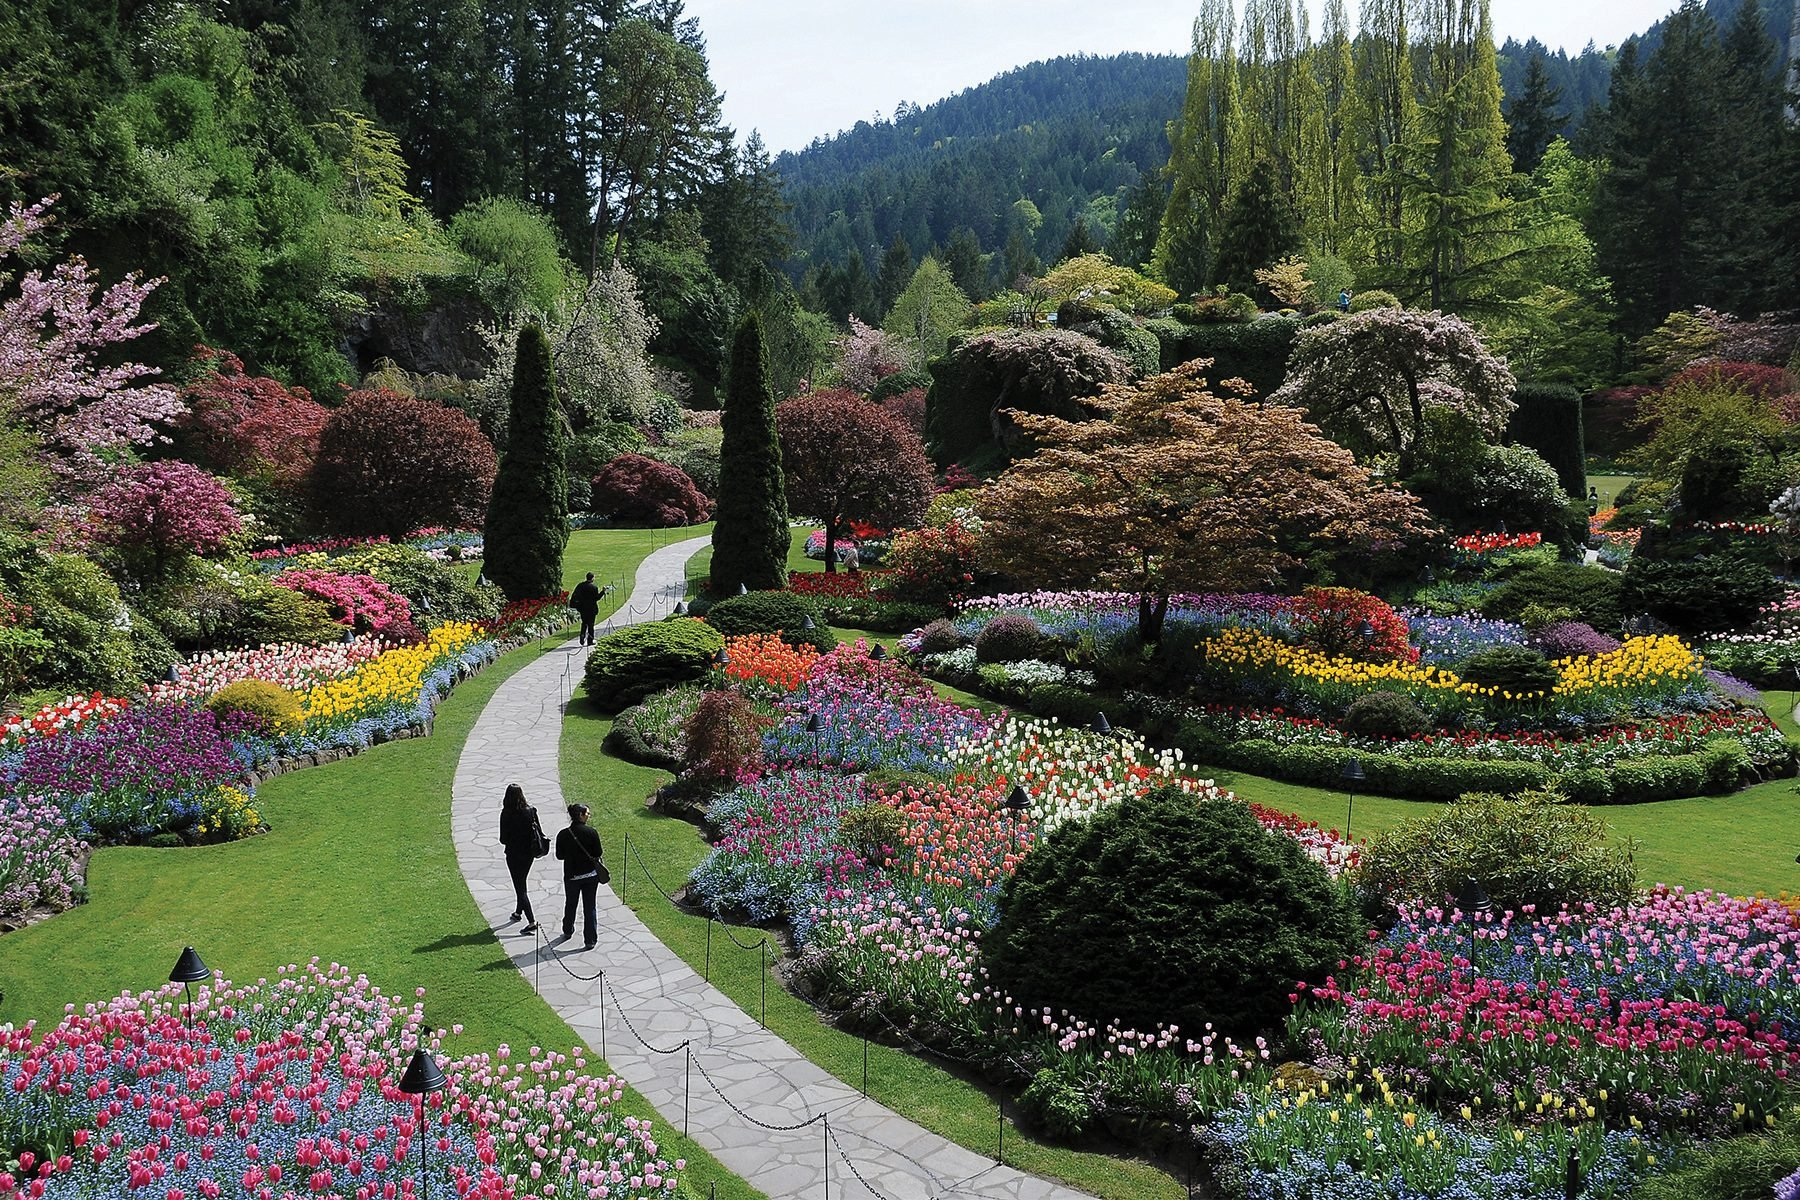 Sunken Garden At The Butchart Gardens Botanical Gardens